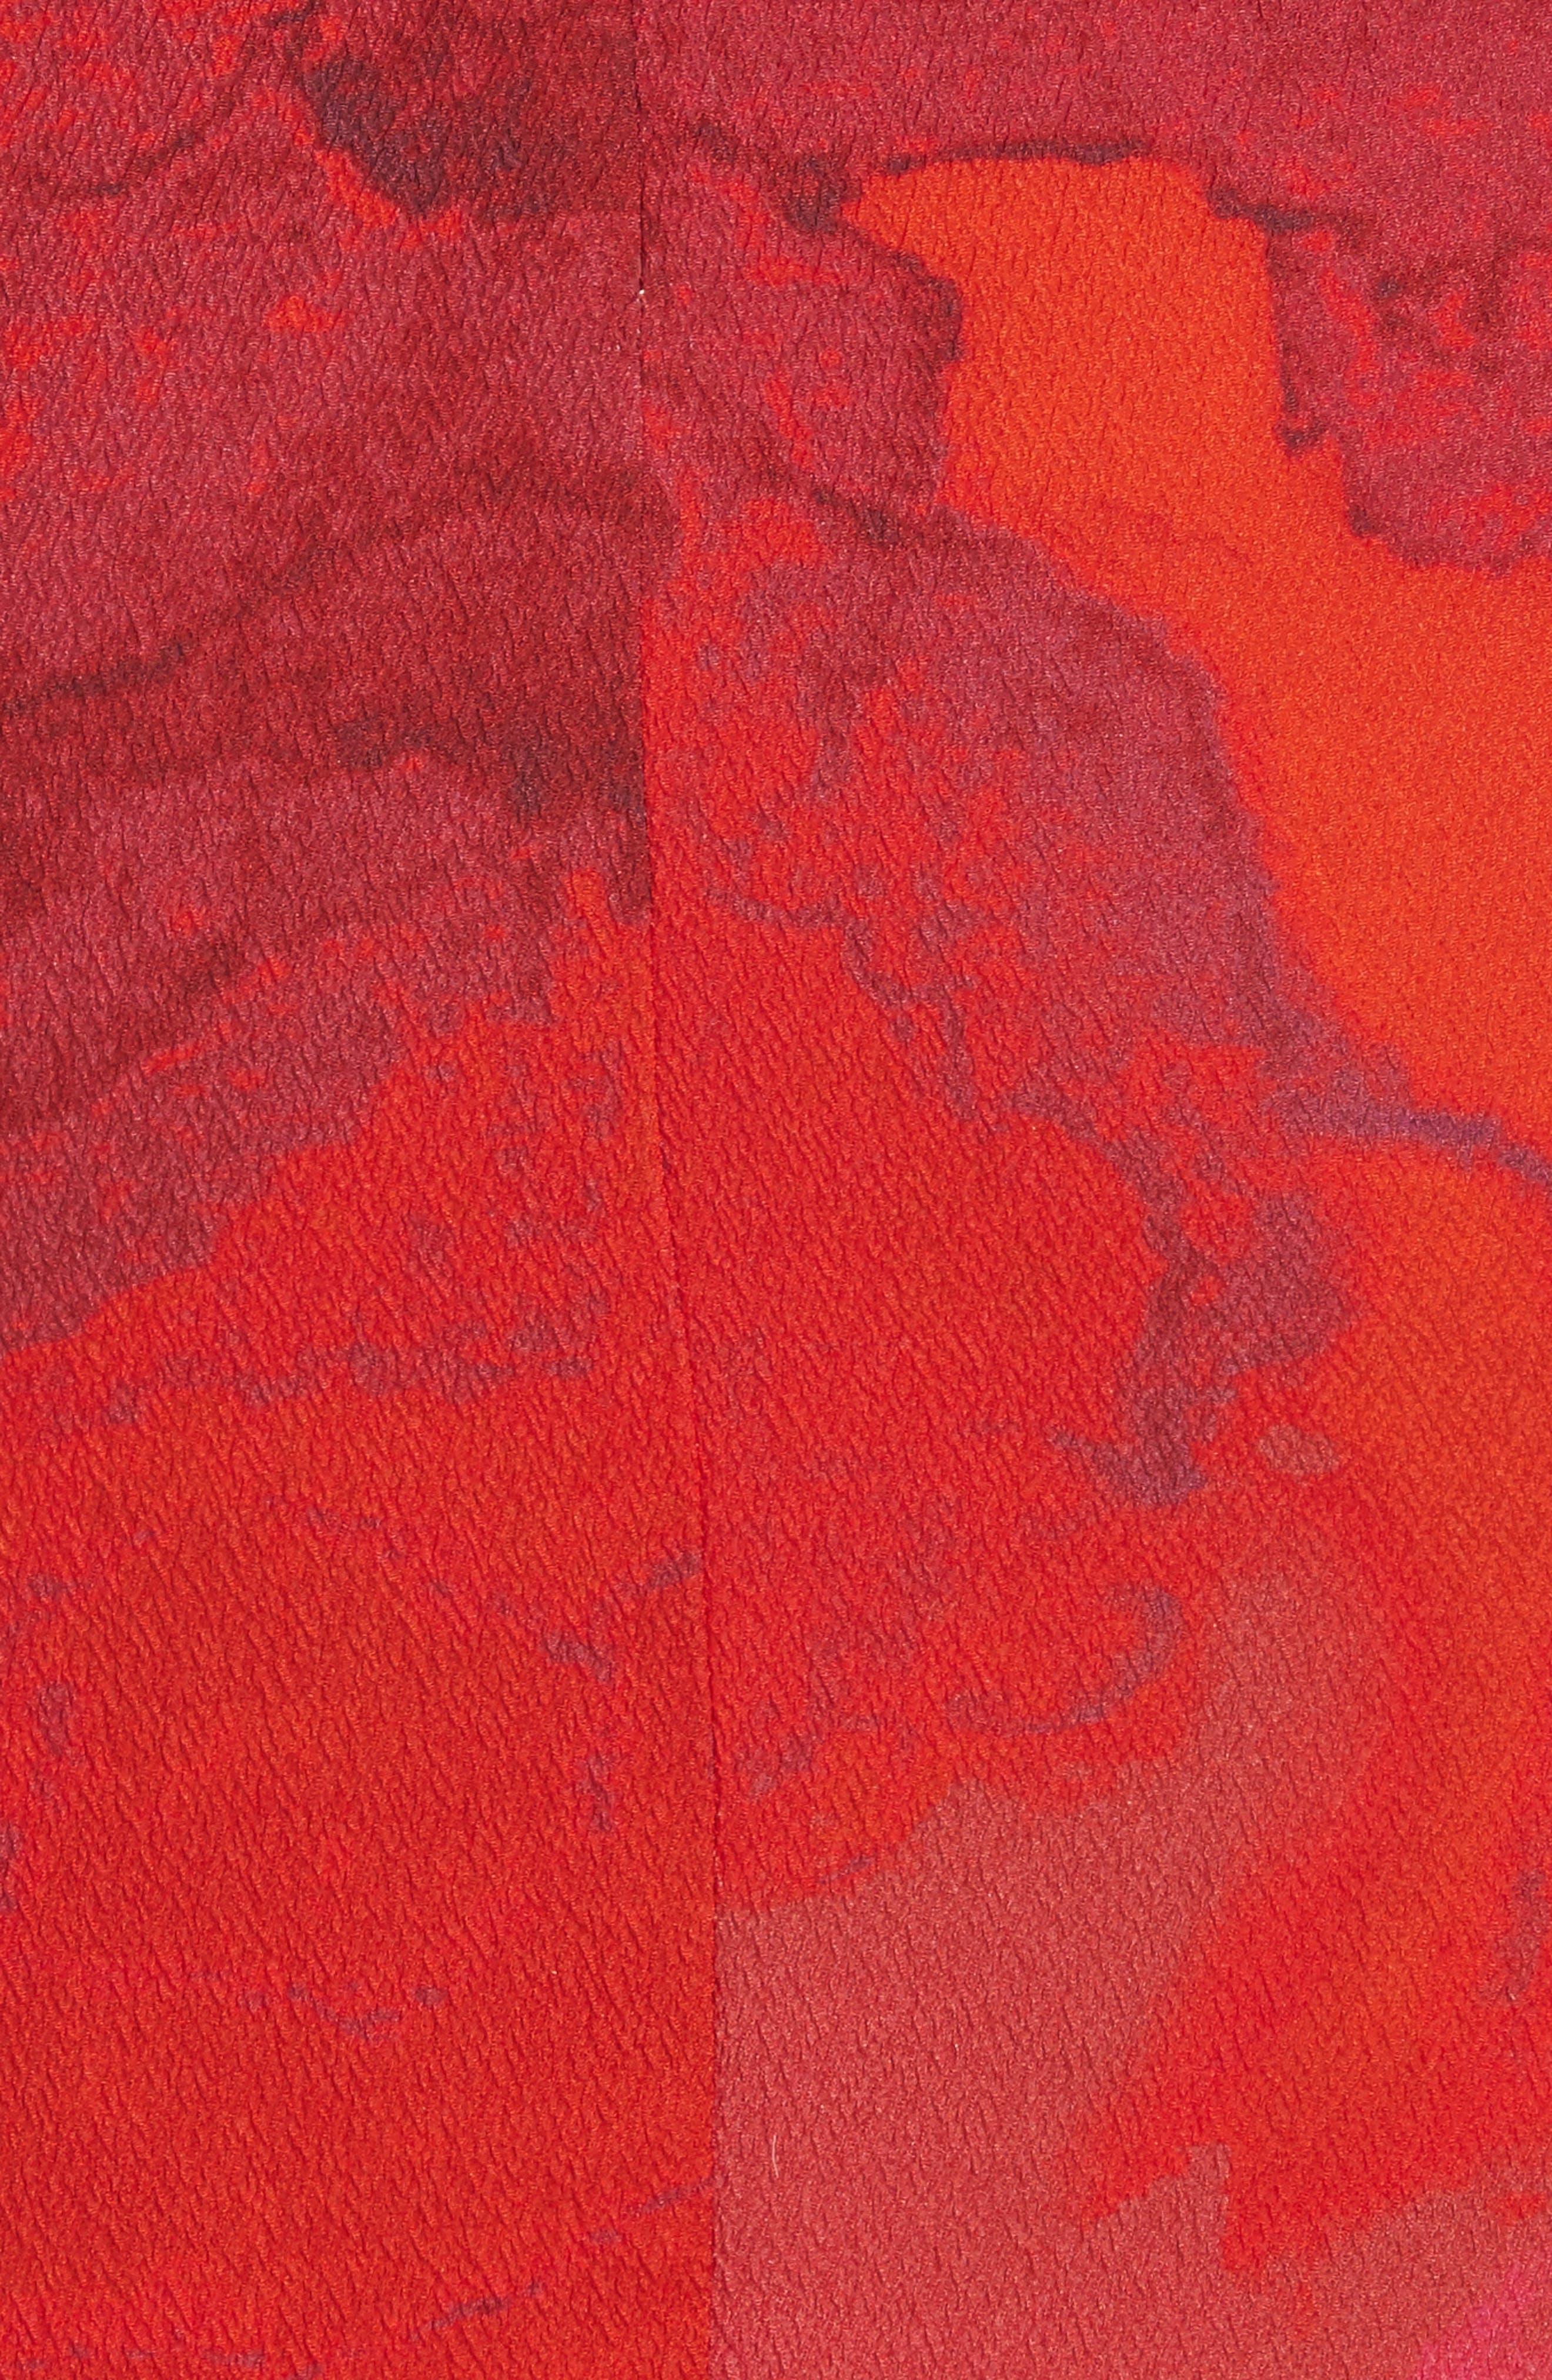 Abstract Print Stretch Silk Sheath Dress,                             Alternate thumbnail 5, color,                             605